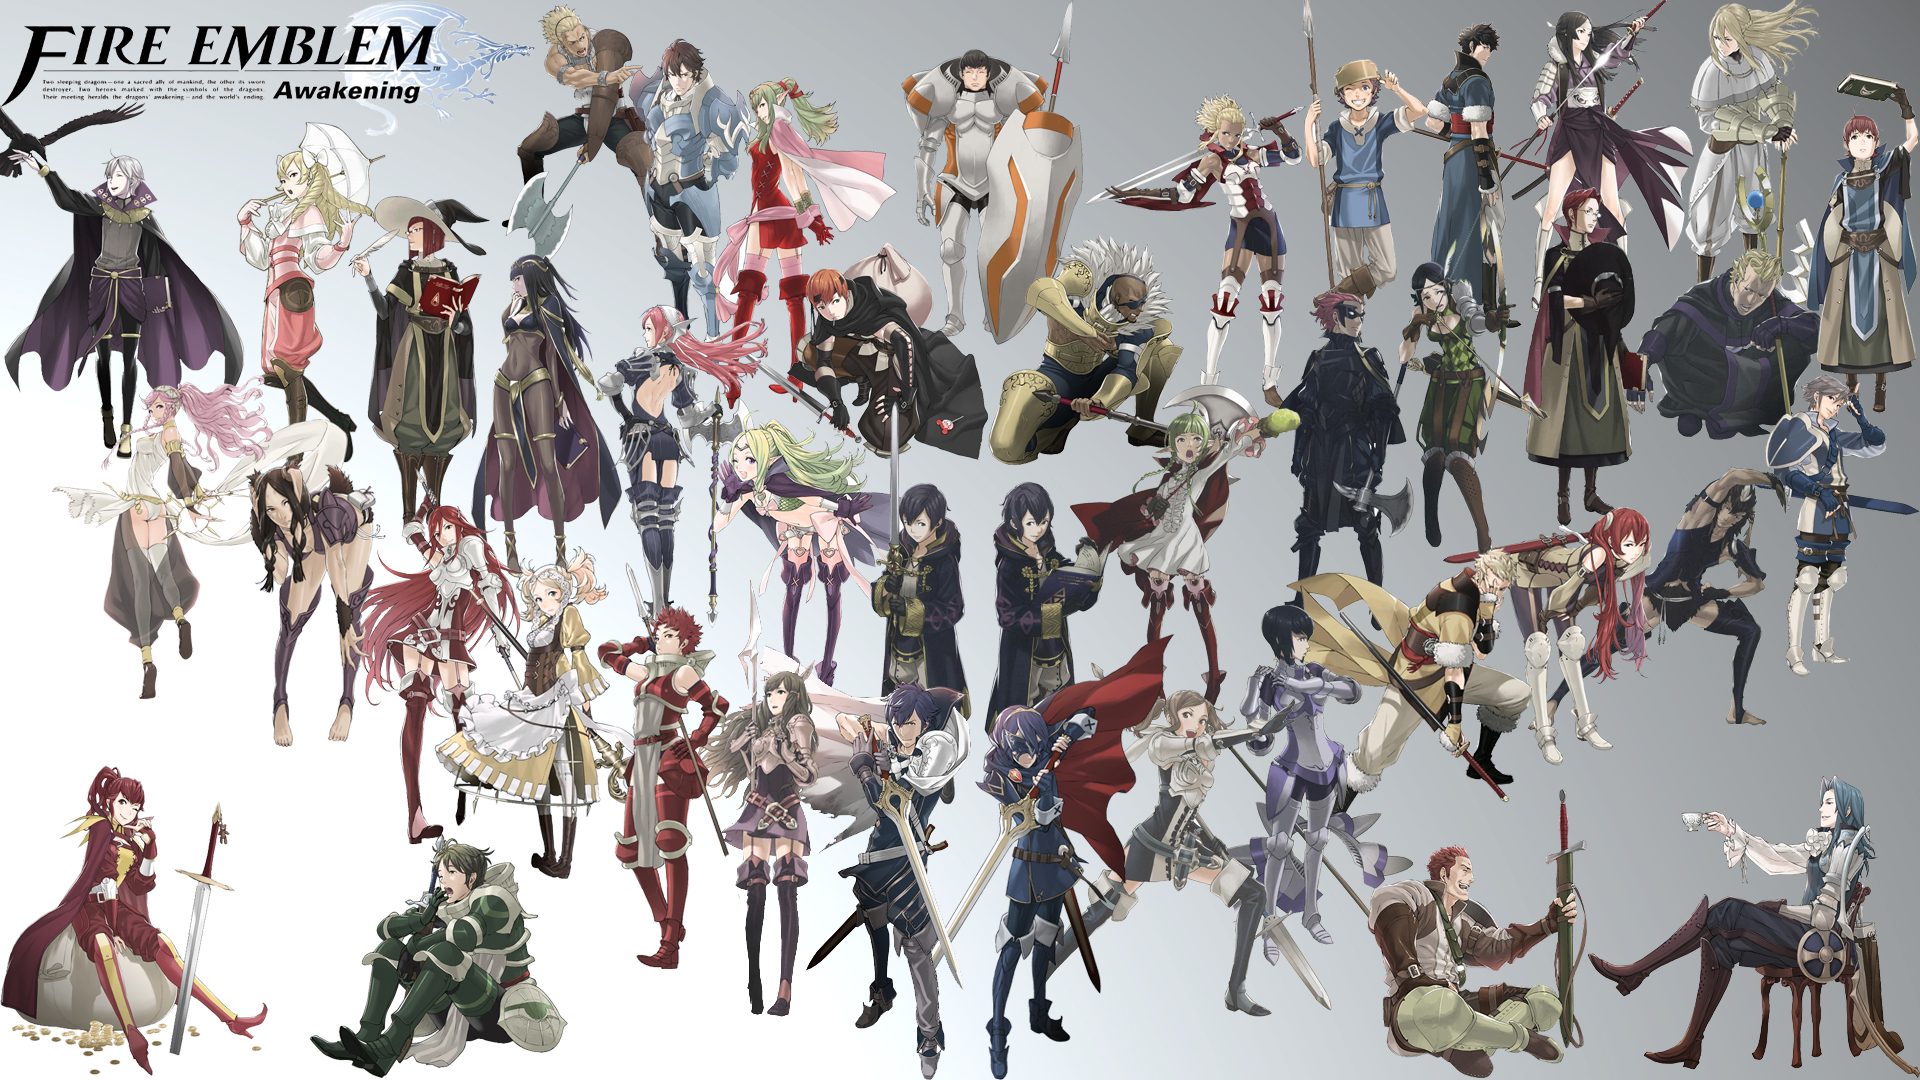 Anime Armor Design Amazing Armor Designs